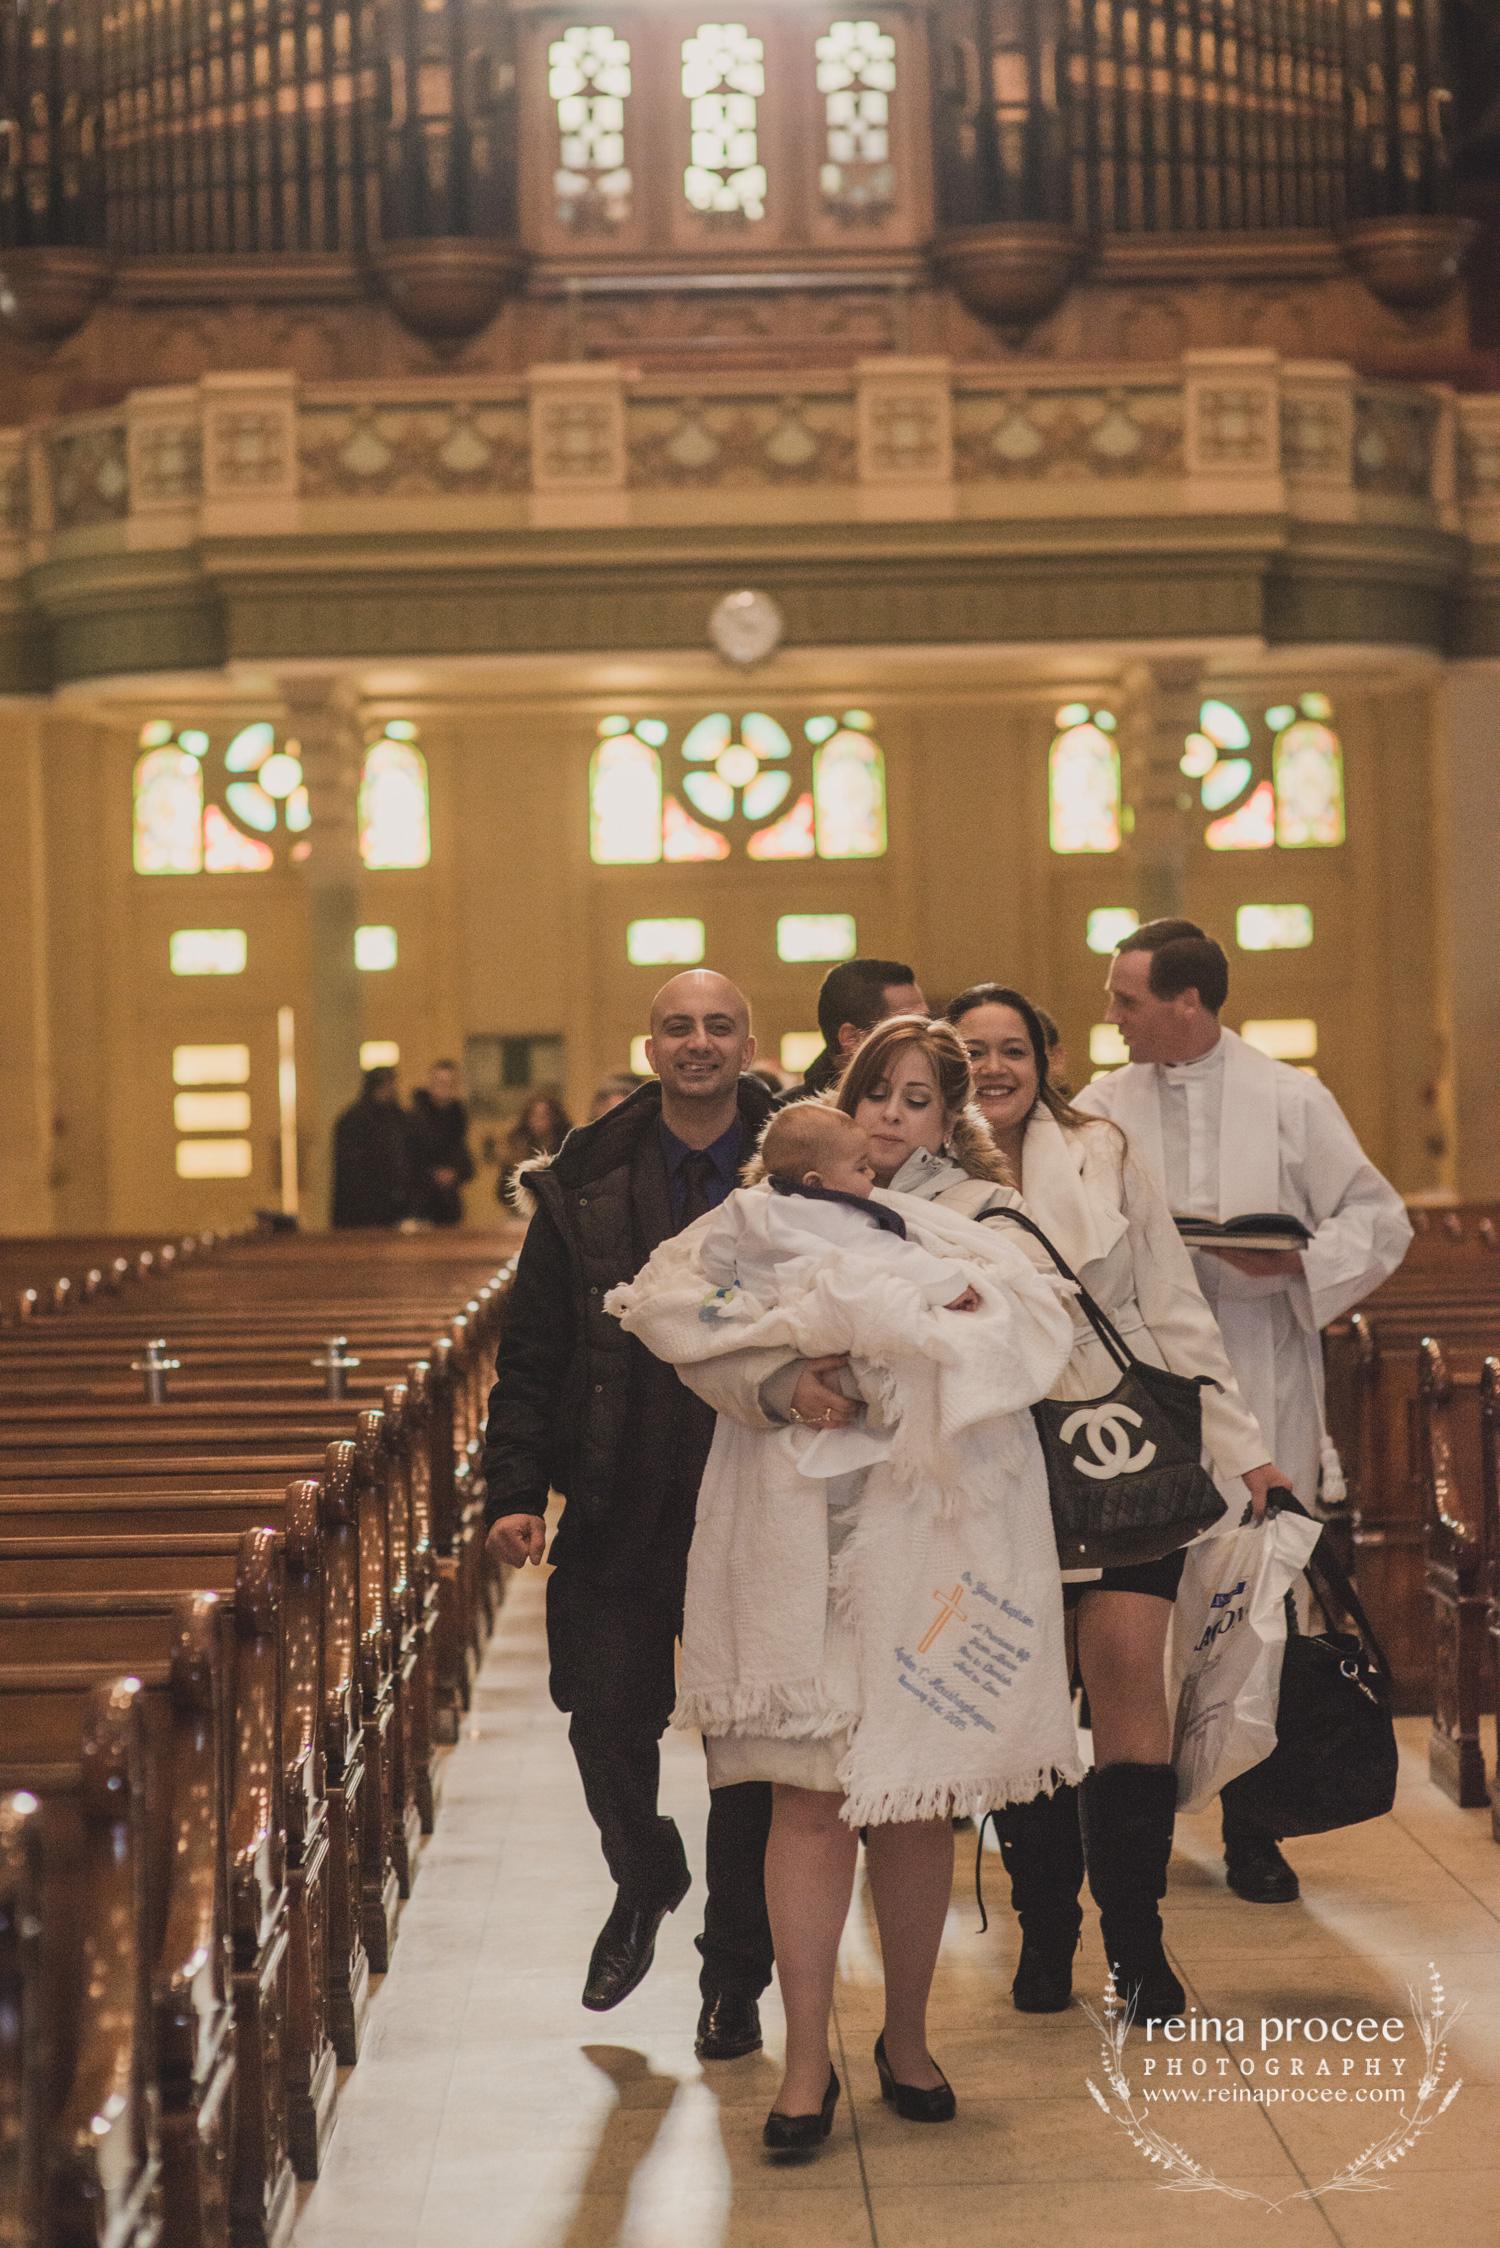 027-baptism-photographer-montreal-family-best-photos-portraits.jpg